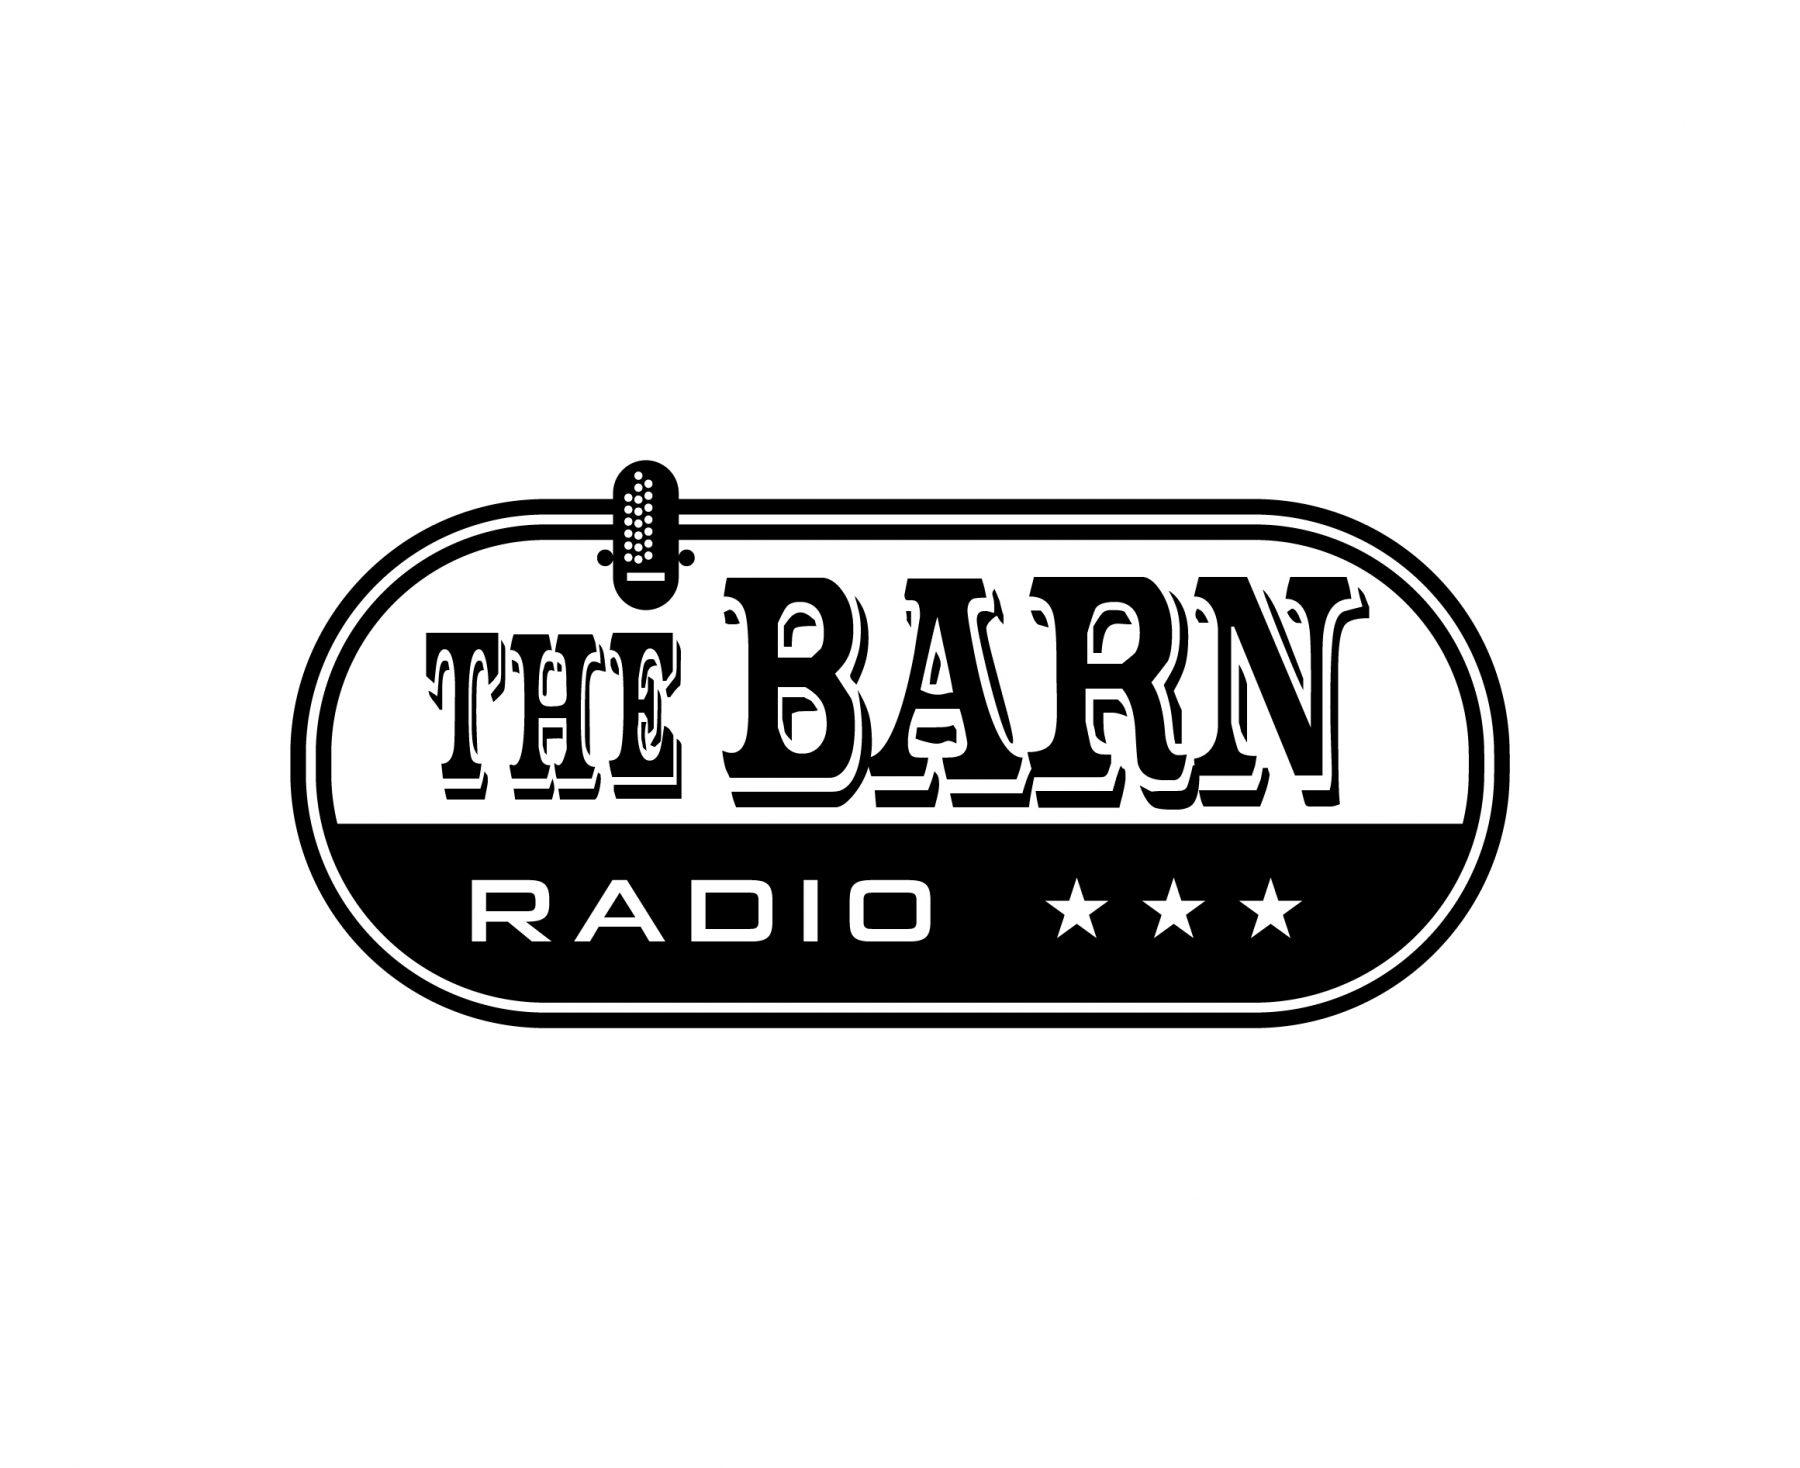 #1 THE BARN RADIO